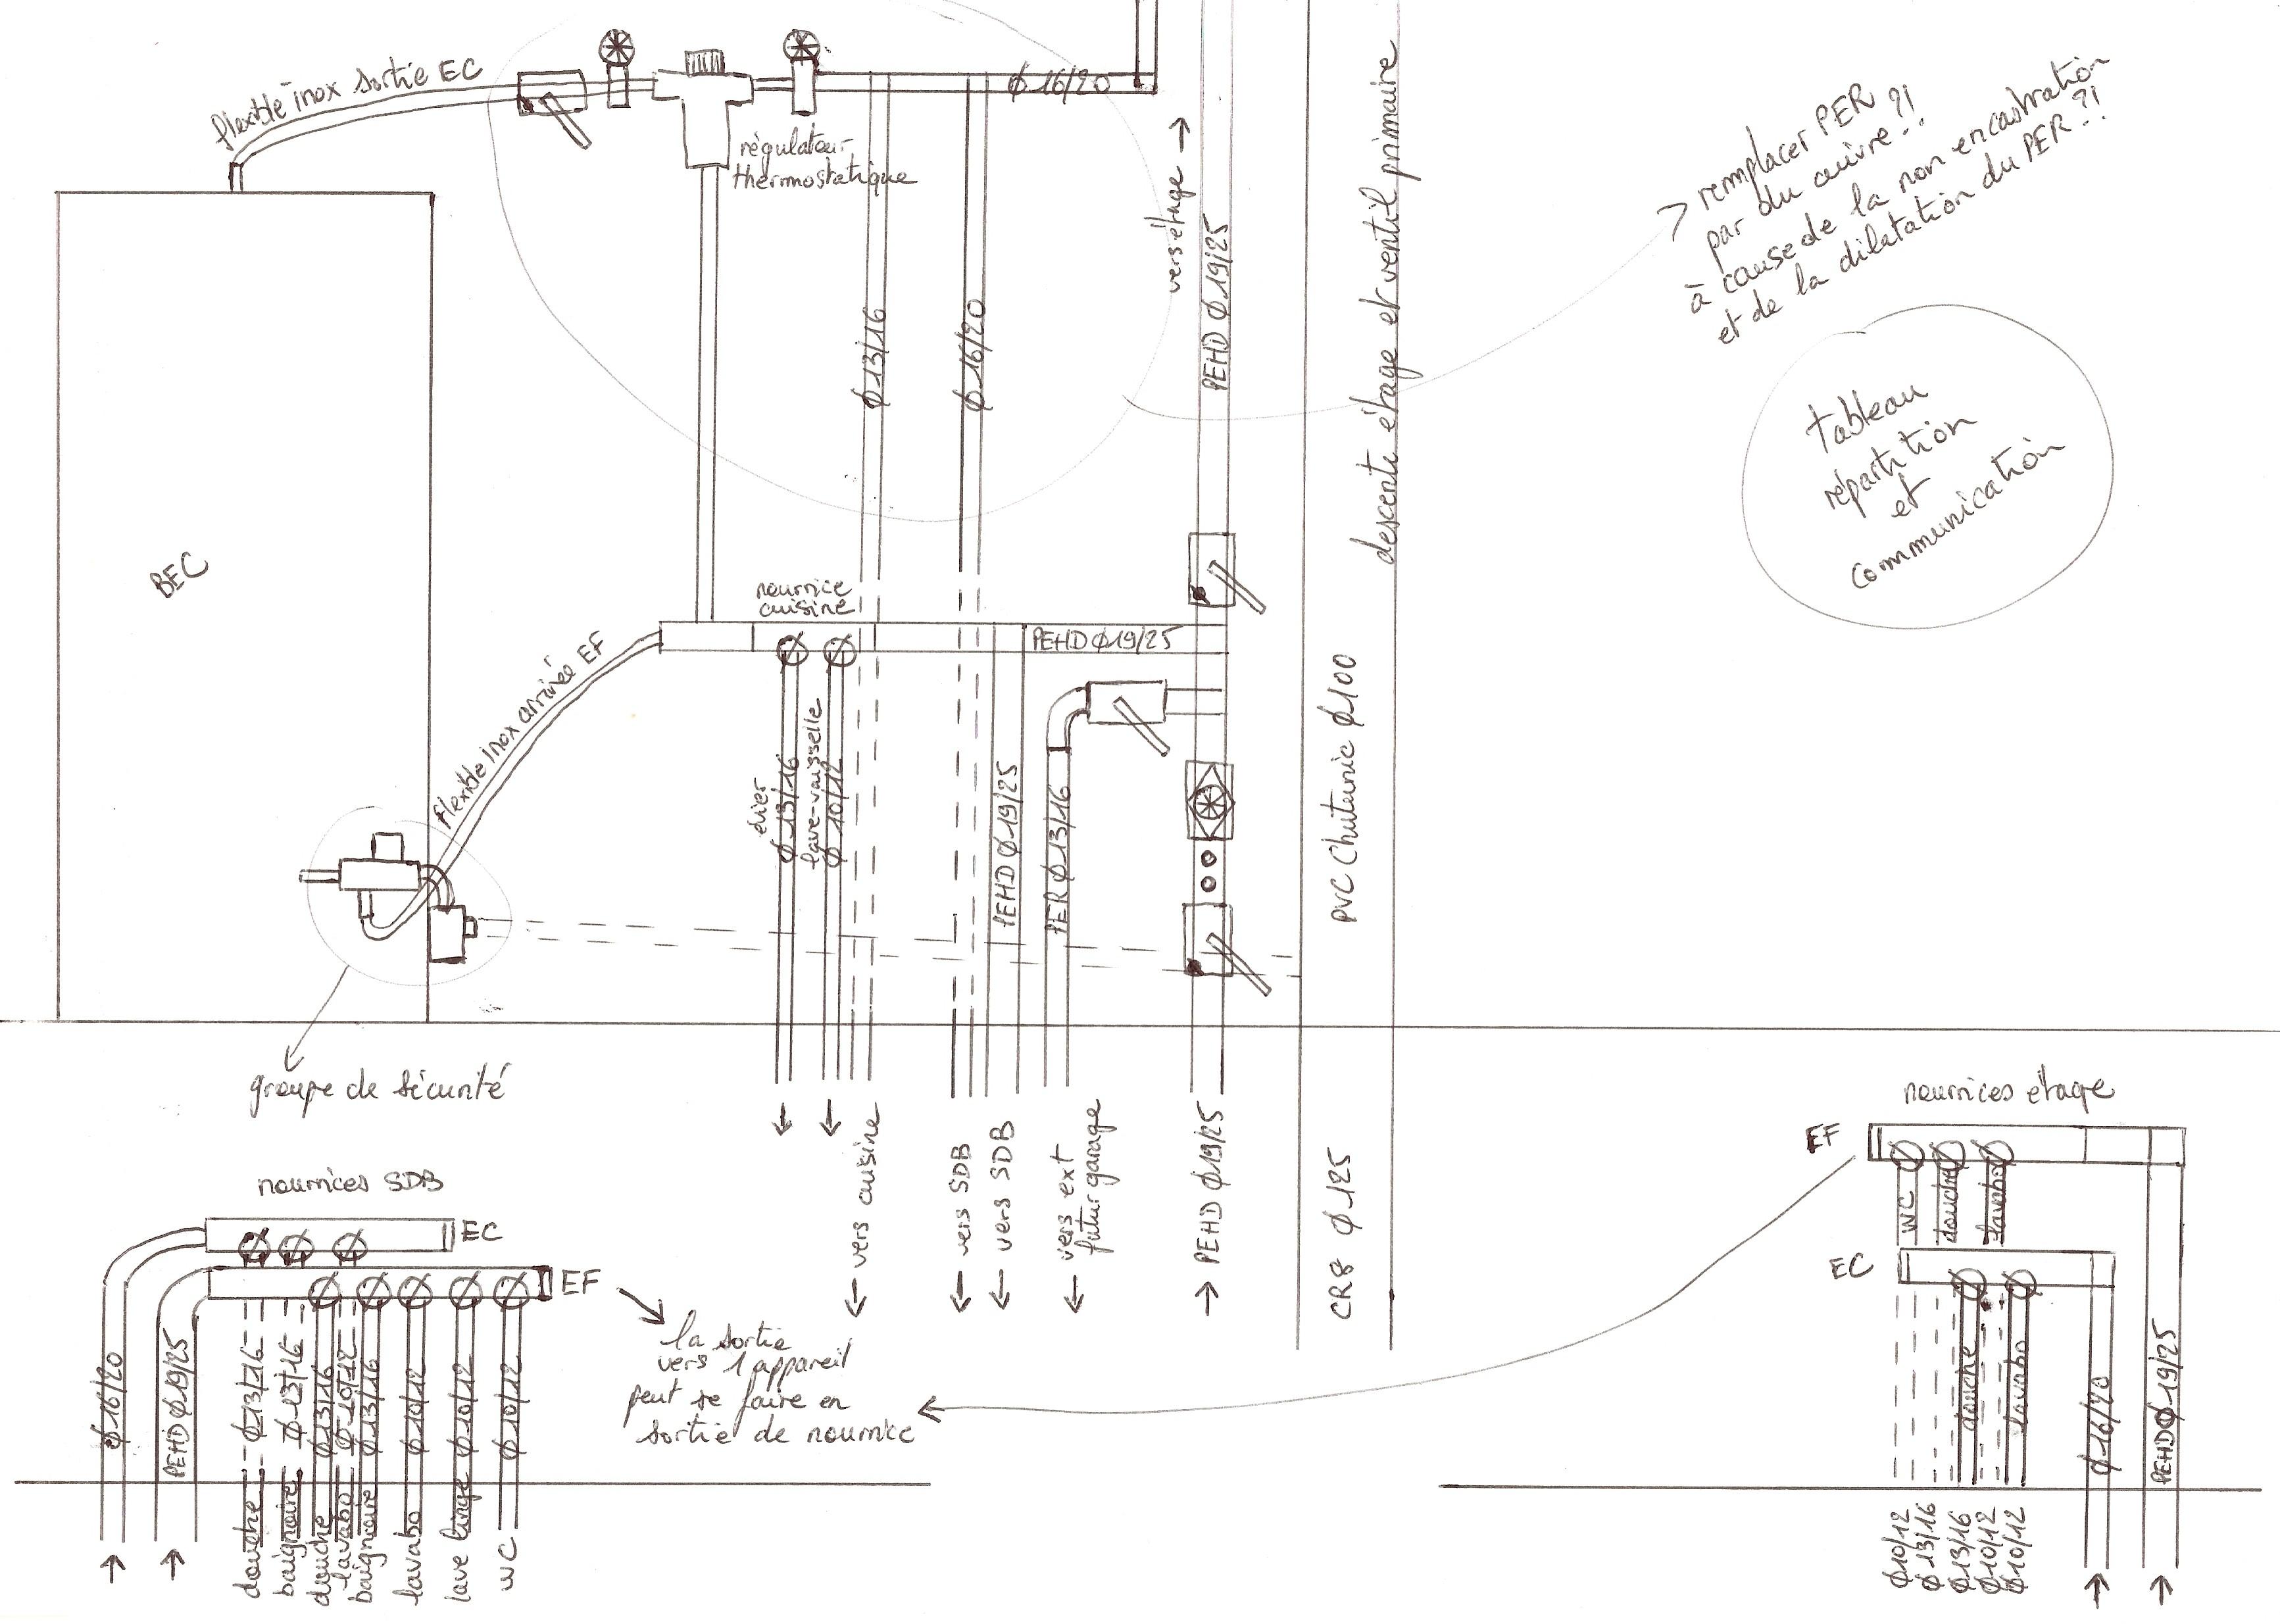 Plan Plomberie PER.jpg, 848.91 kb, 3466 x 2469